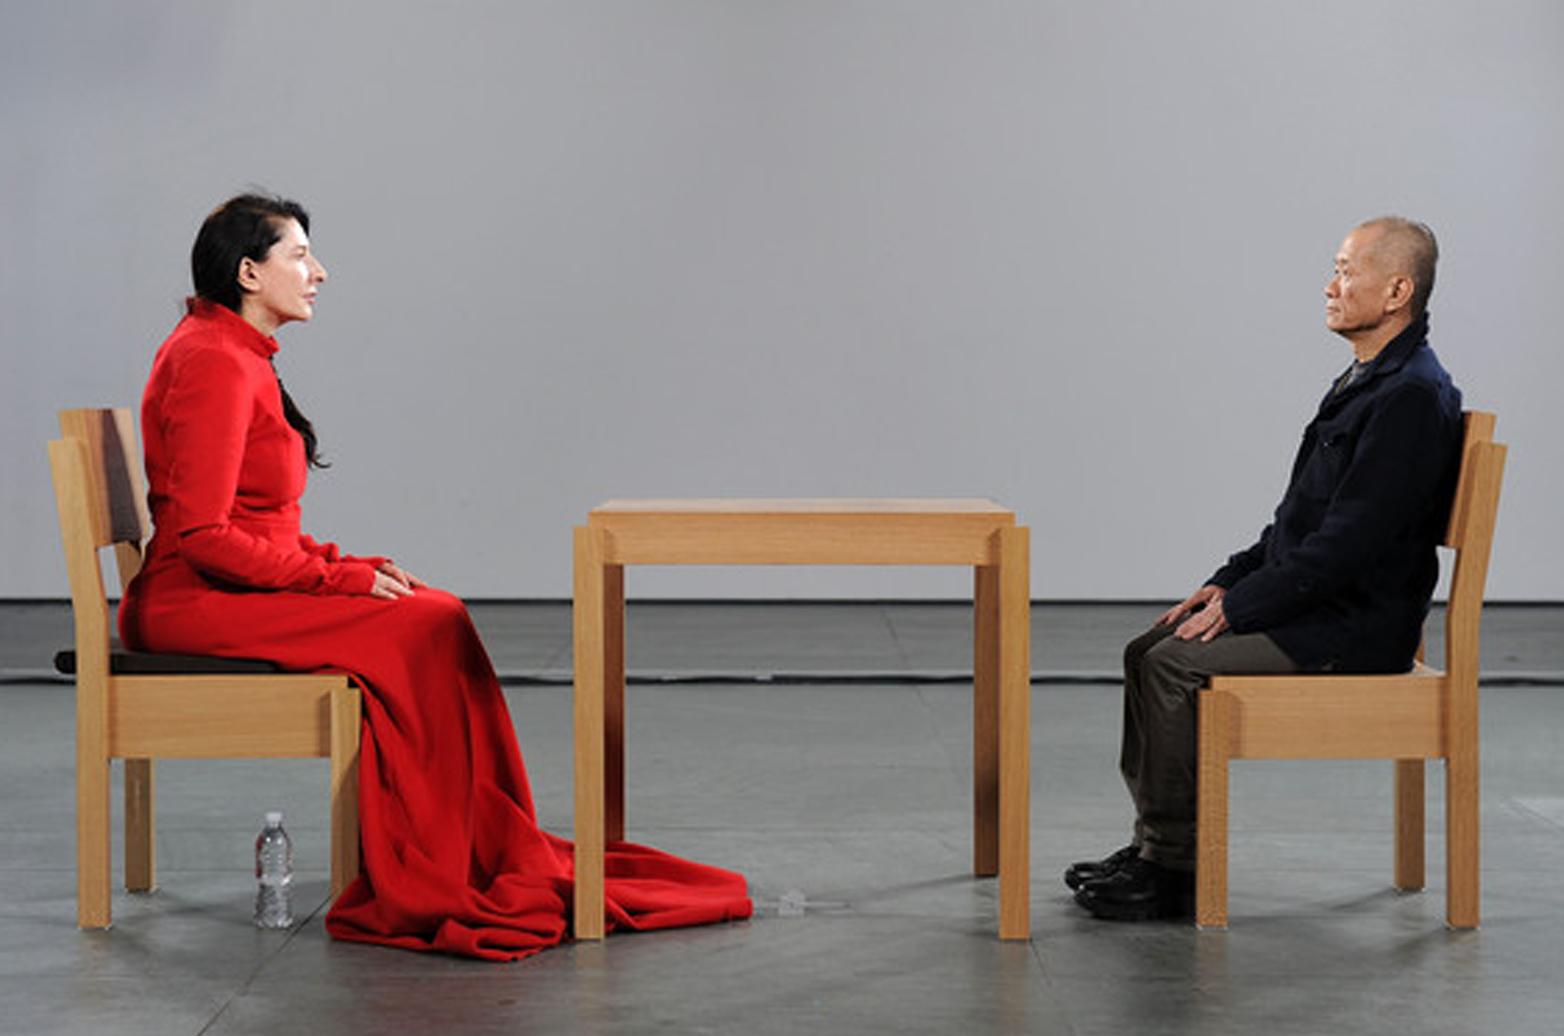 MARINA ABRAMOVIĆ: LA ARTISTA ESTÁ PRESENTE